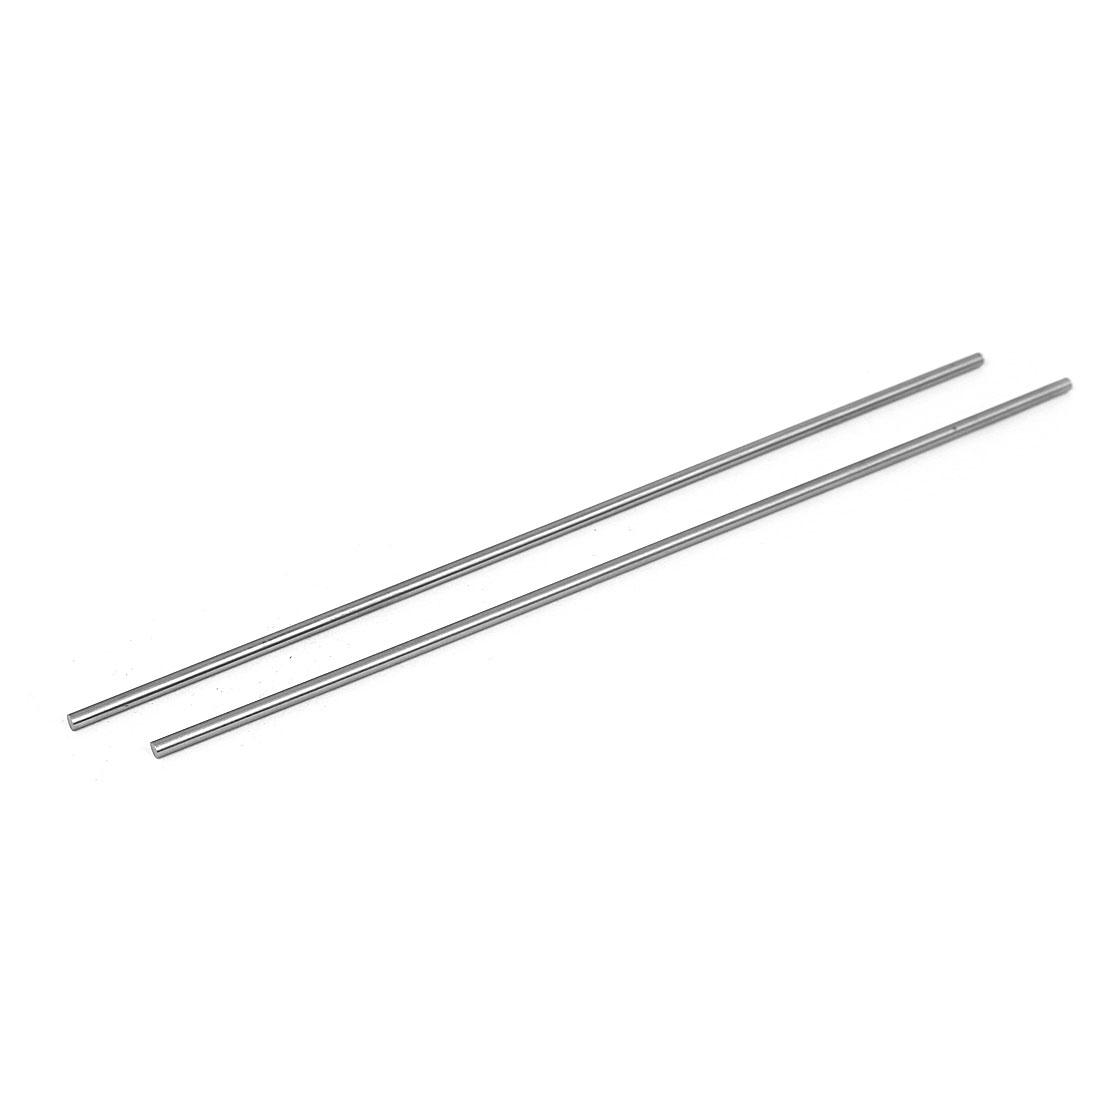 3mm x 200mm Metal Machine Turning Tools Rod Bar Lathe Round Stick 2pcs